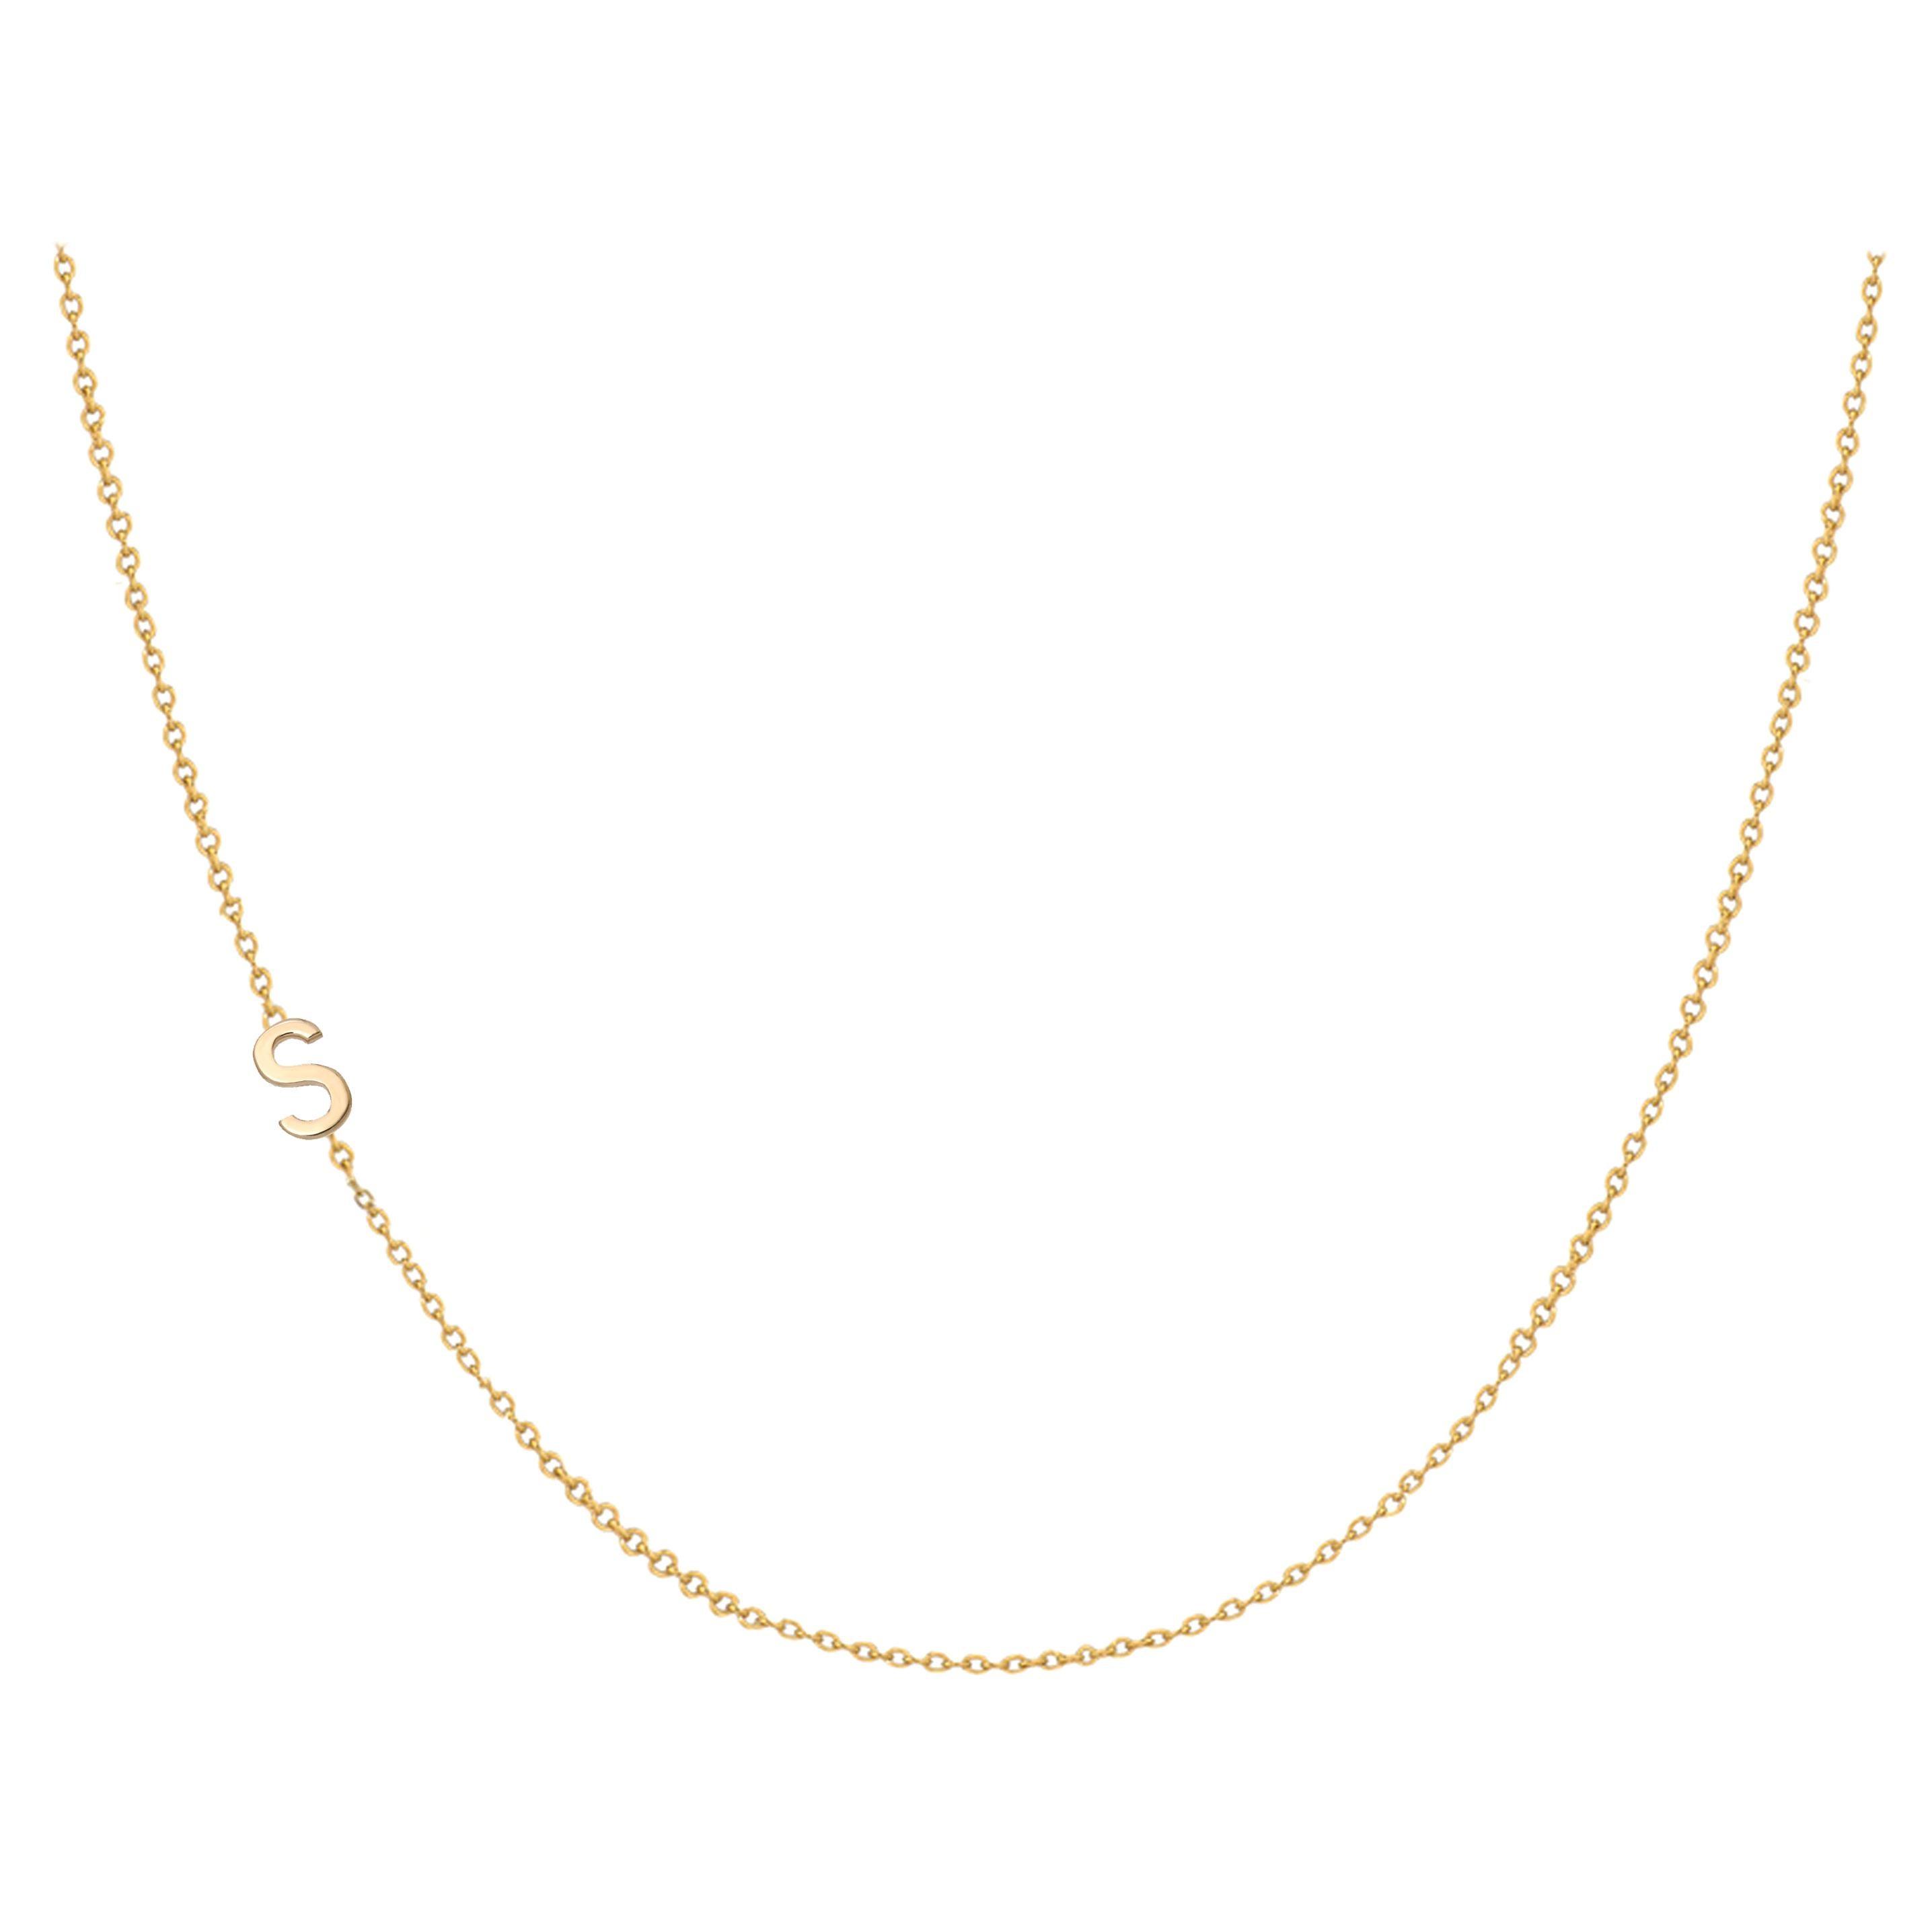 14 Karat Gold Asymmetrical Initial Necklace, S